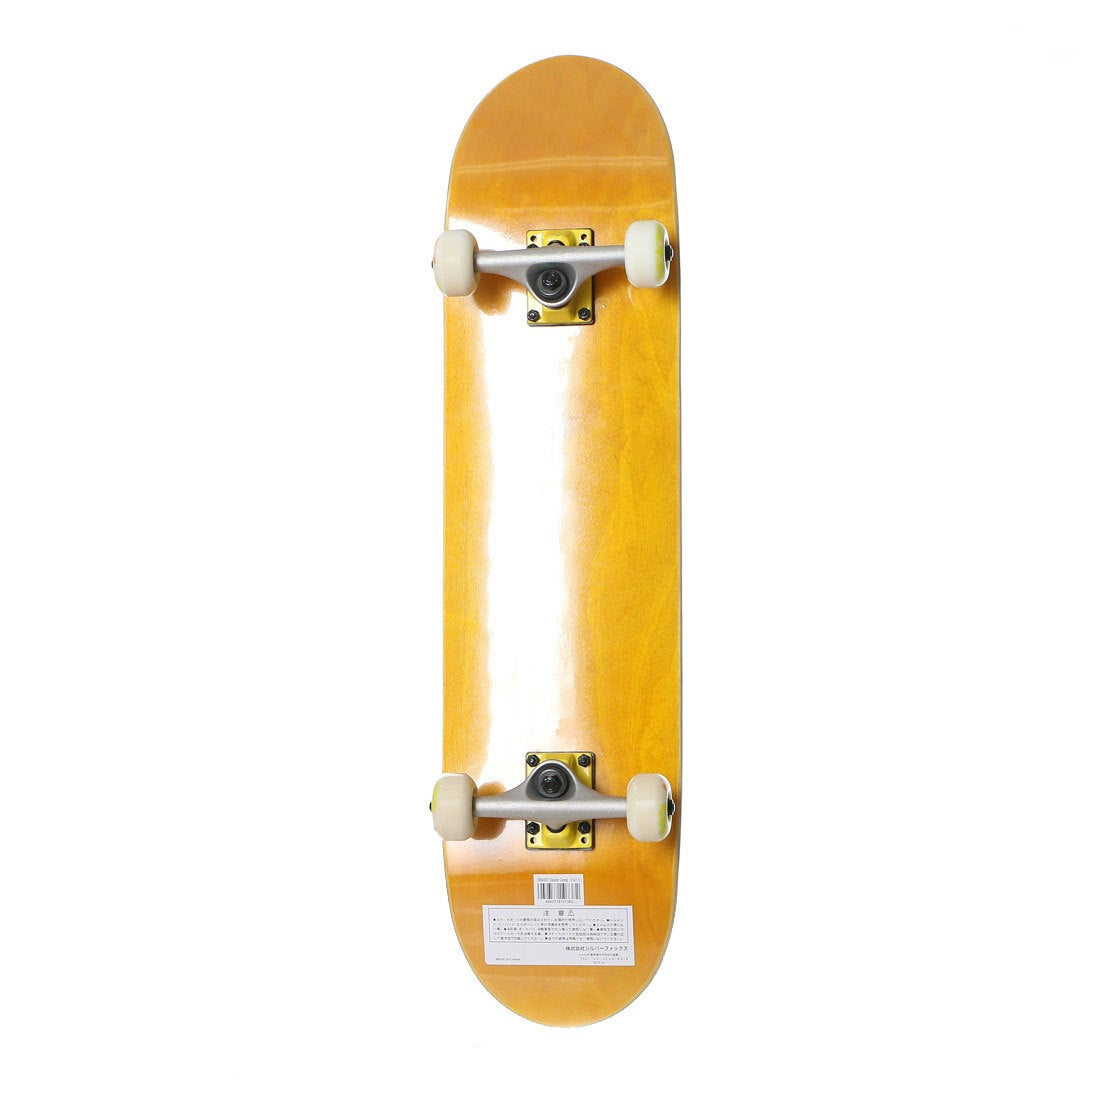 【SALE 5%OFF】シルバーフォックス Silver Fox ユニセックス エクストリームスポーツ ボード/スケート スケートボードコンプリート SB4007